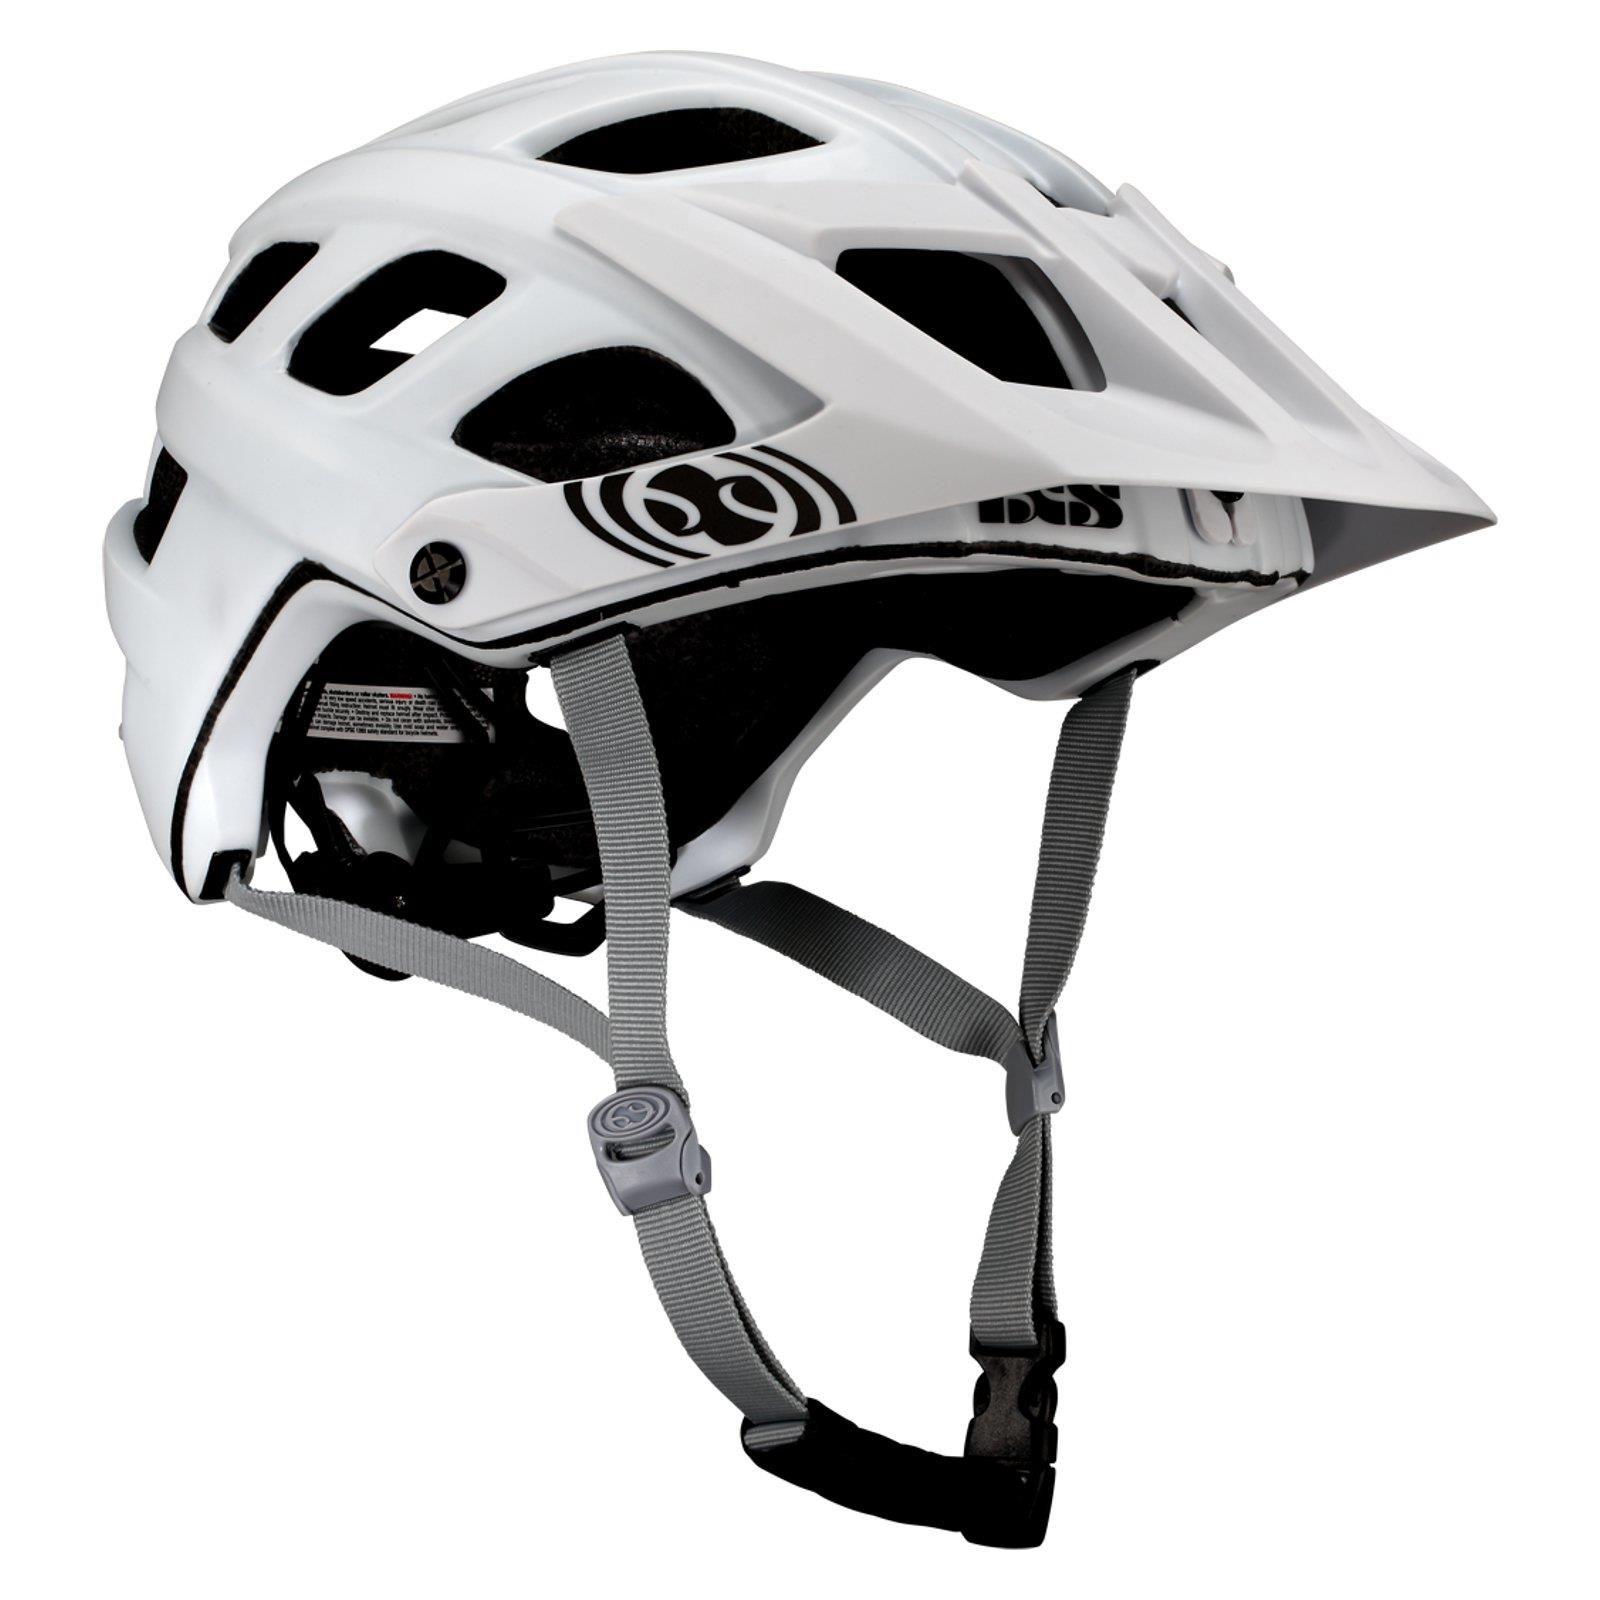 Ixs Trail Rs Evo Fahrrad Helm All Mountain Bike Am Mtb Enduro Dh Downhill Inmold Ad Sponsored Evo Fahrrad Helm All Mountain Bike Enduro Mtb